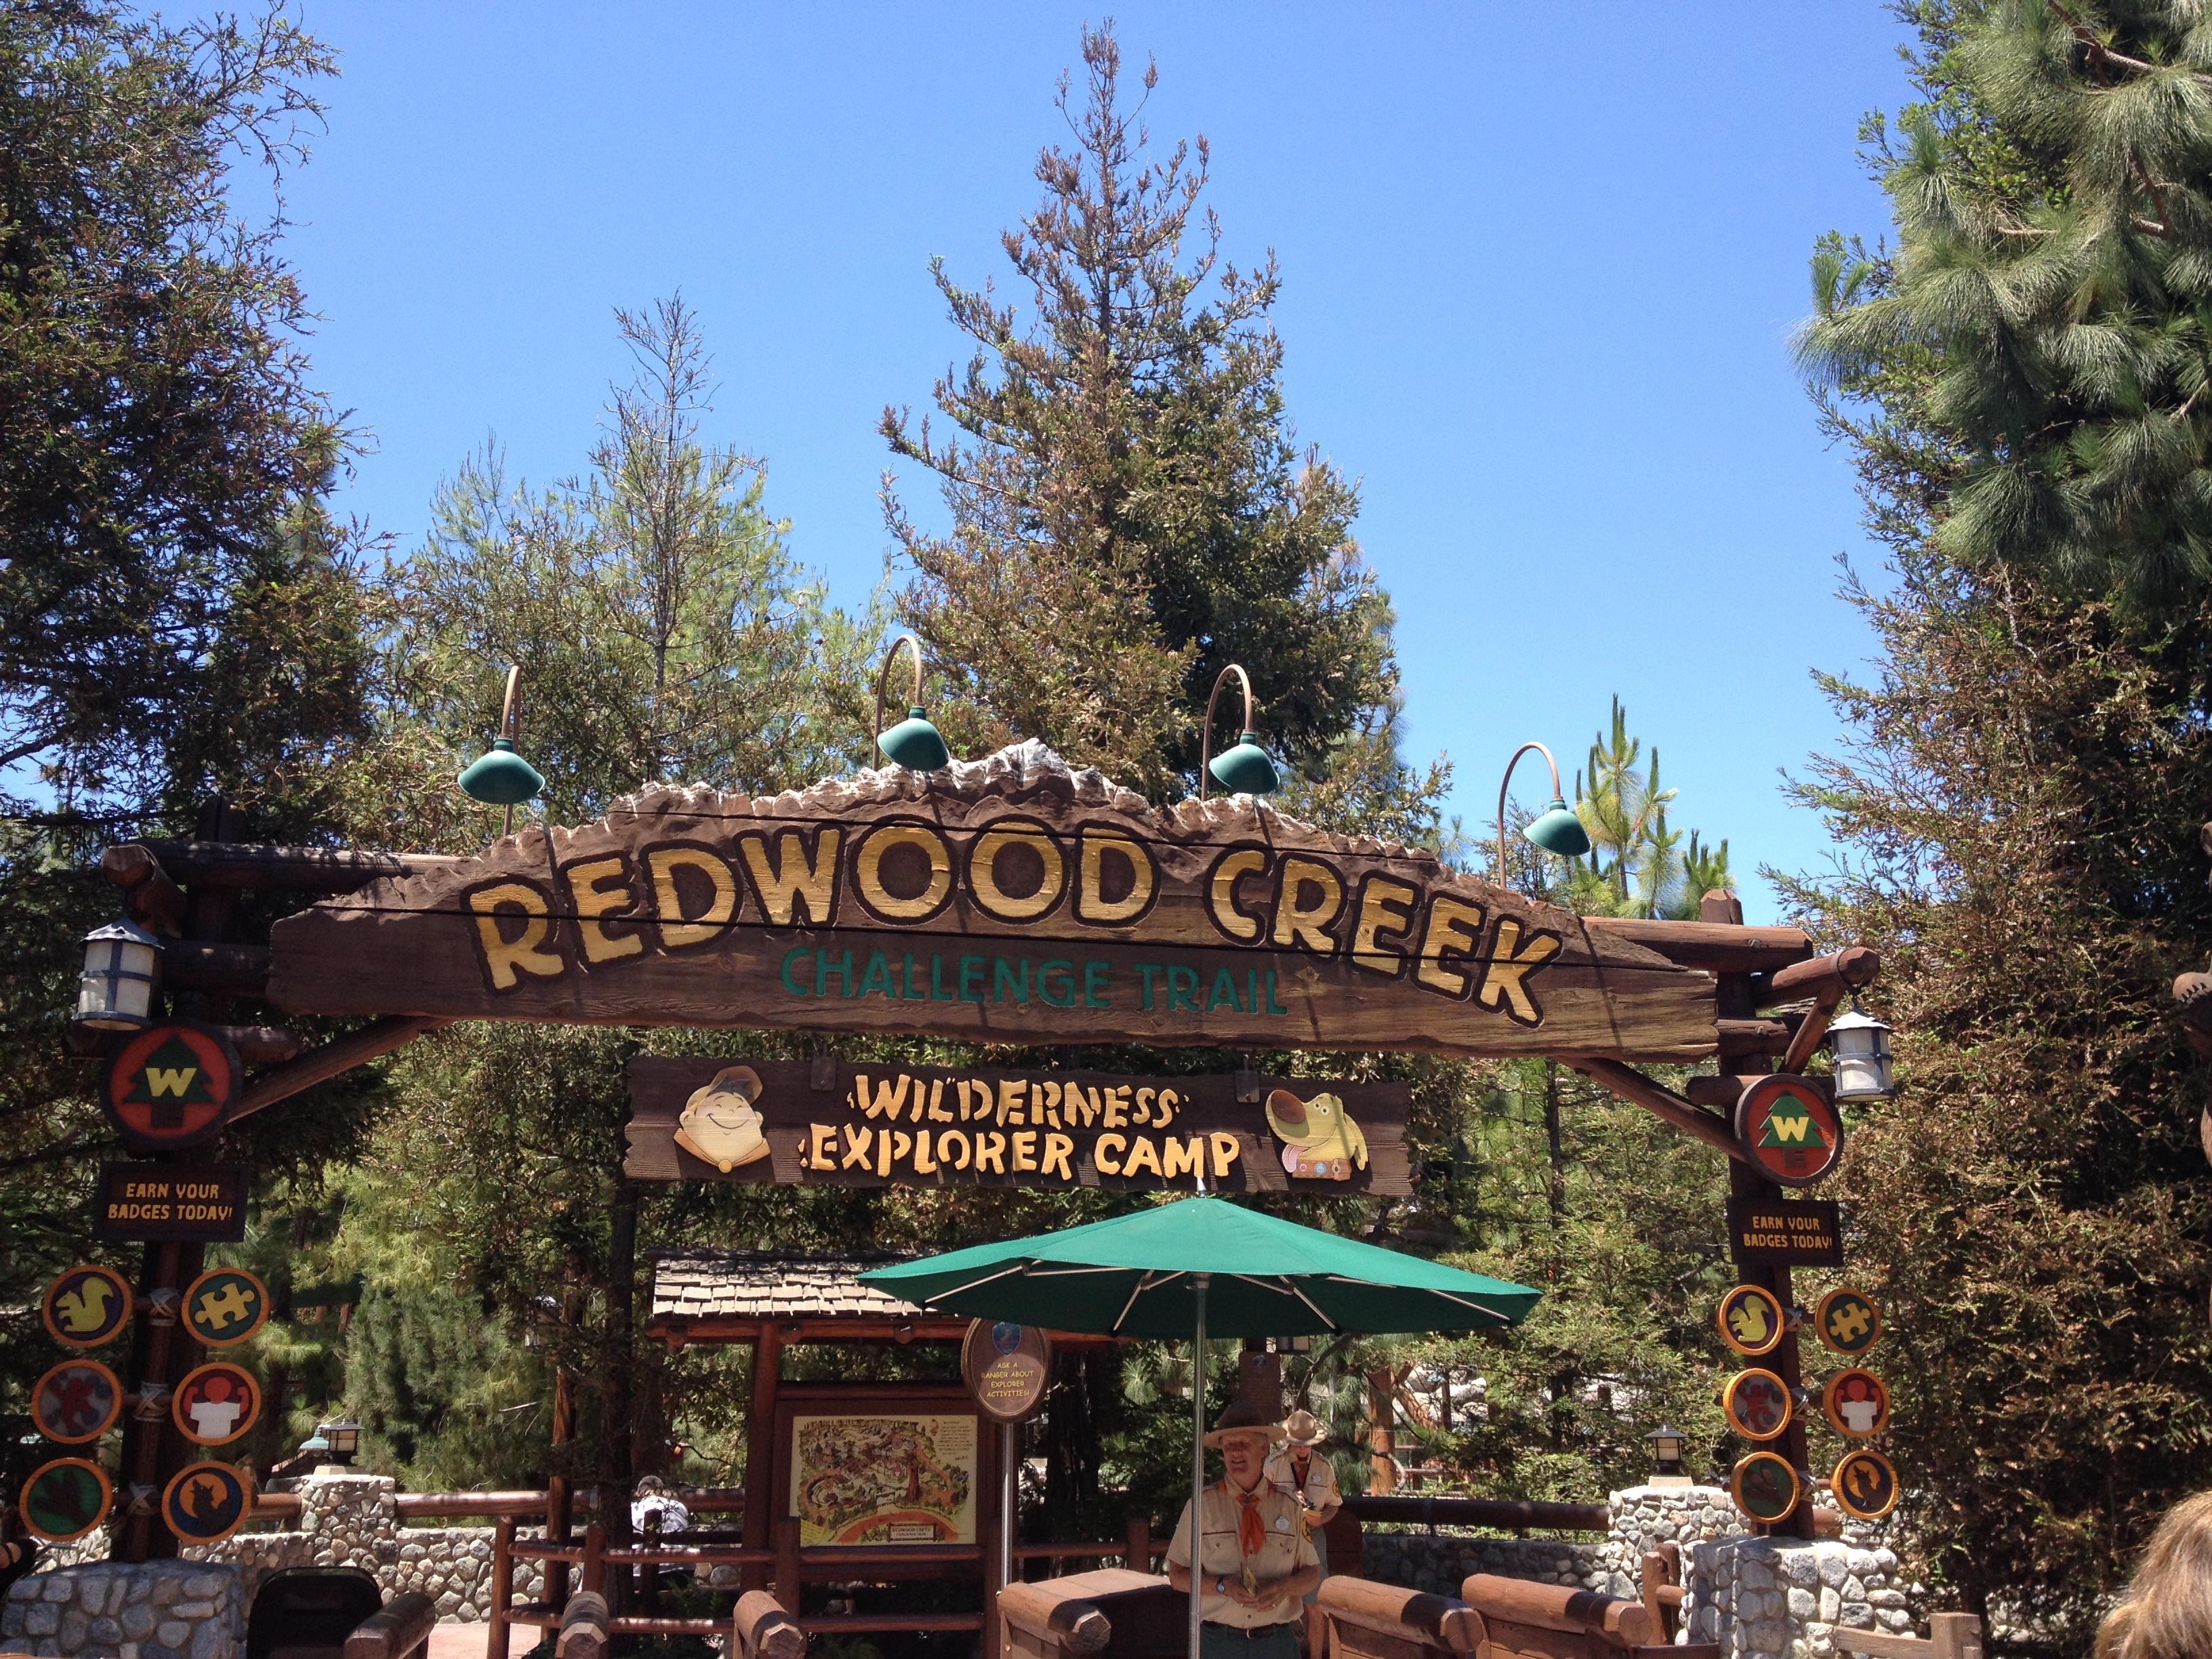 Redwood Creek Challenge Trail at Disney's California Adventure